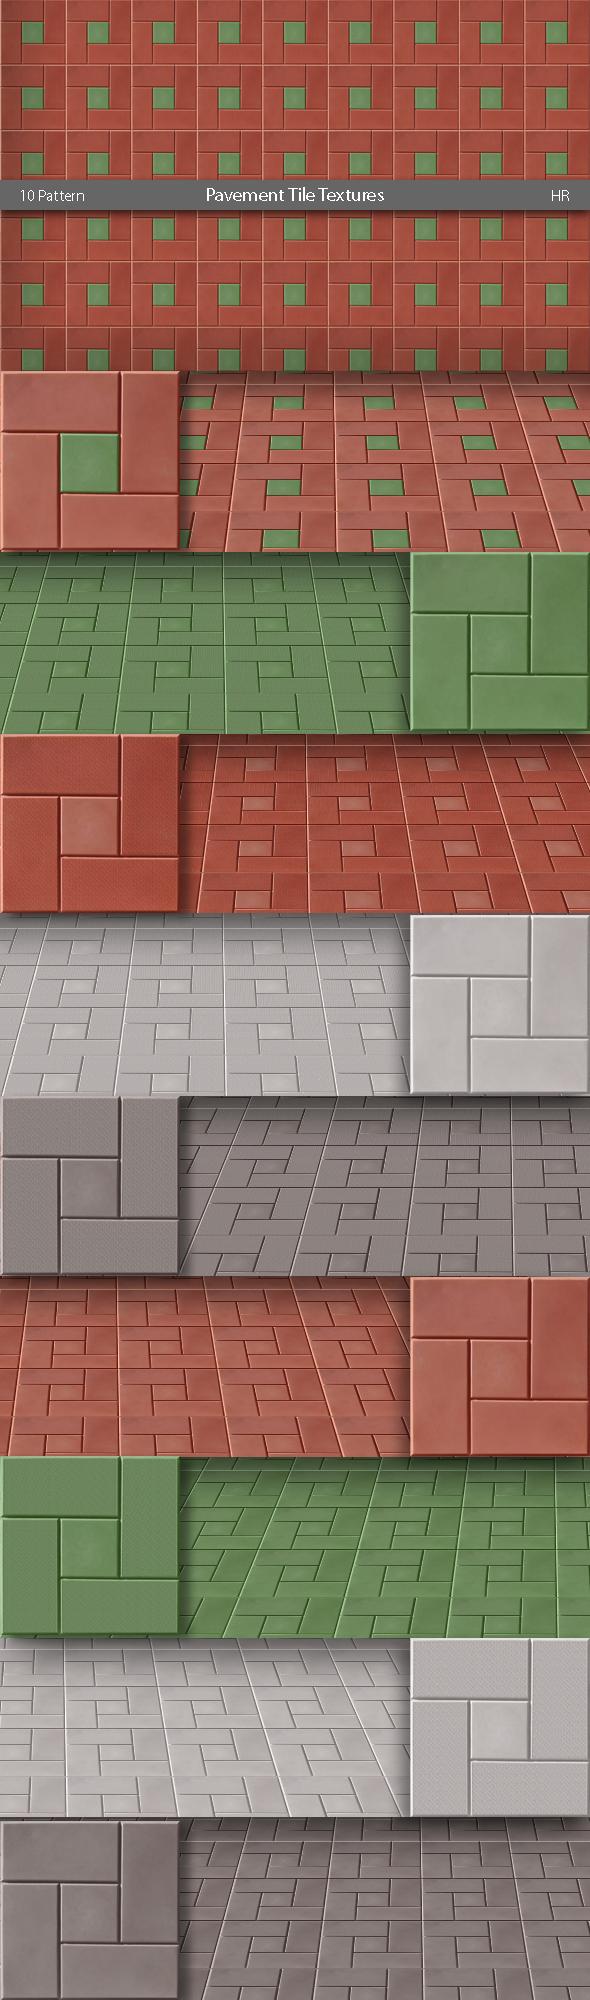 Pavement Tile Patterns